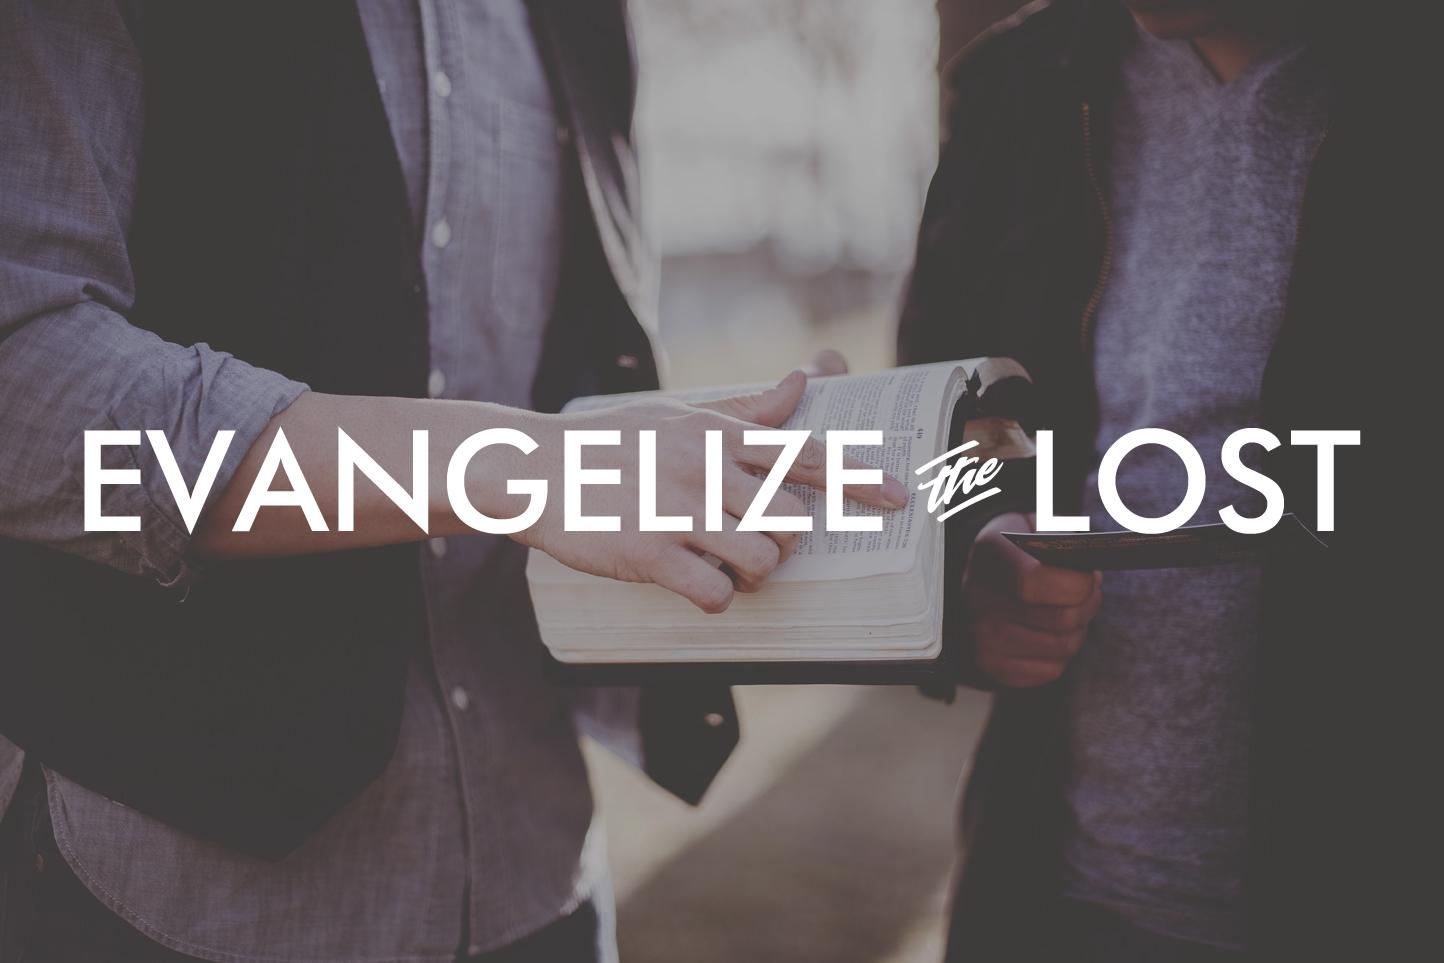 Evangelize copy.jpg